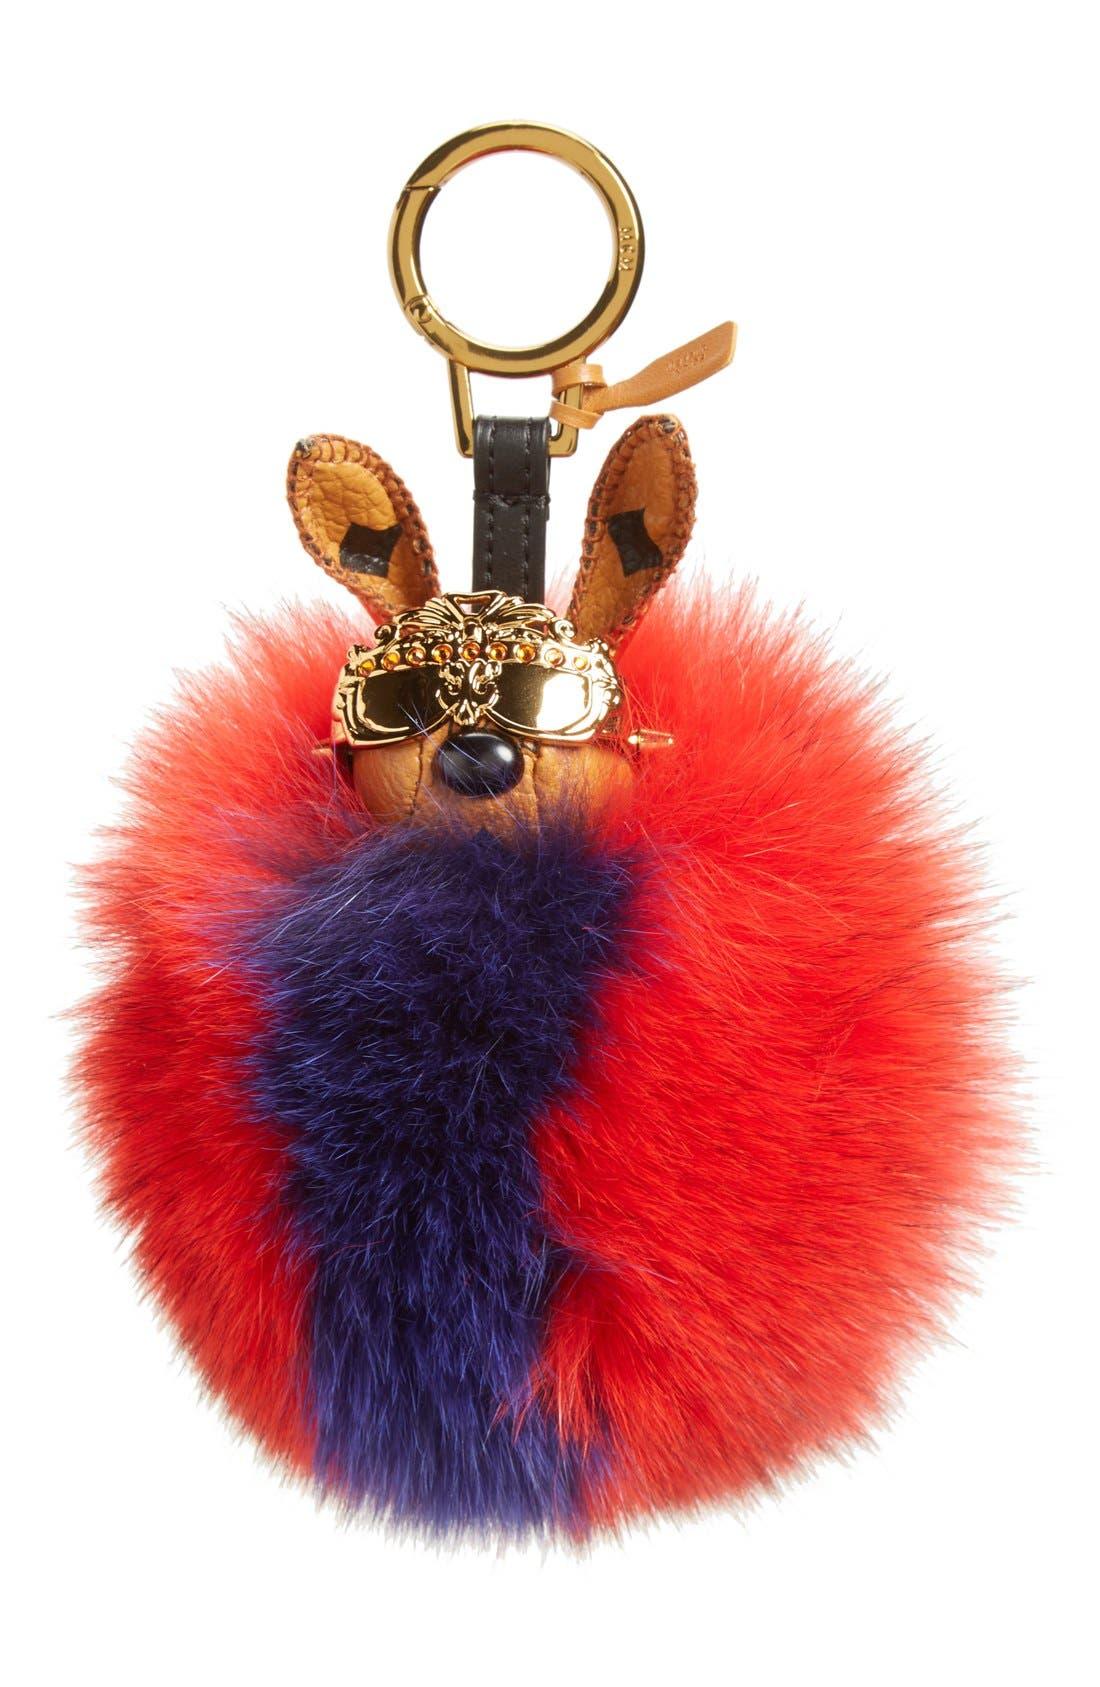 Alternate Image 1 Selected - MCM 'Rabbit' Genuine Fox Fur Bag Charm